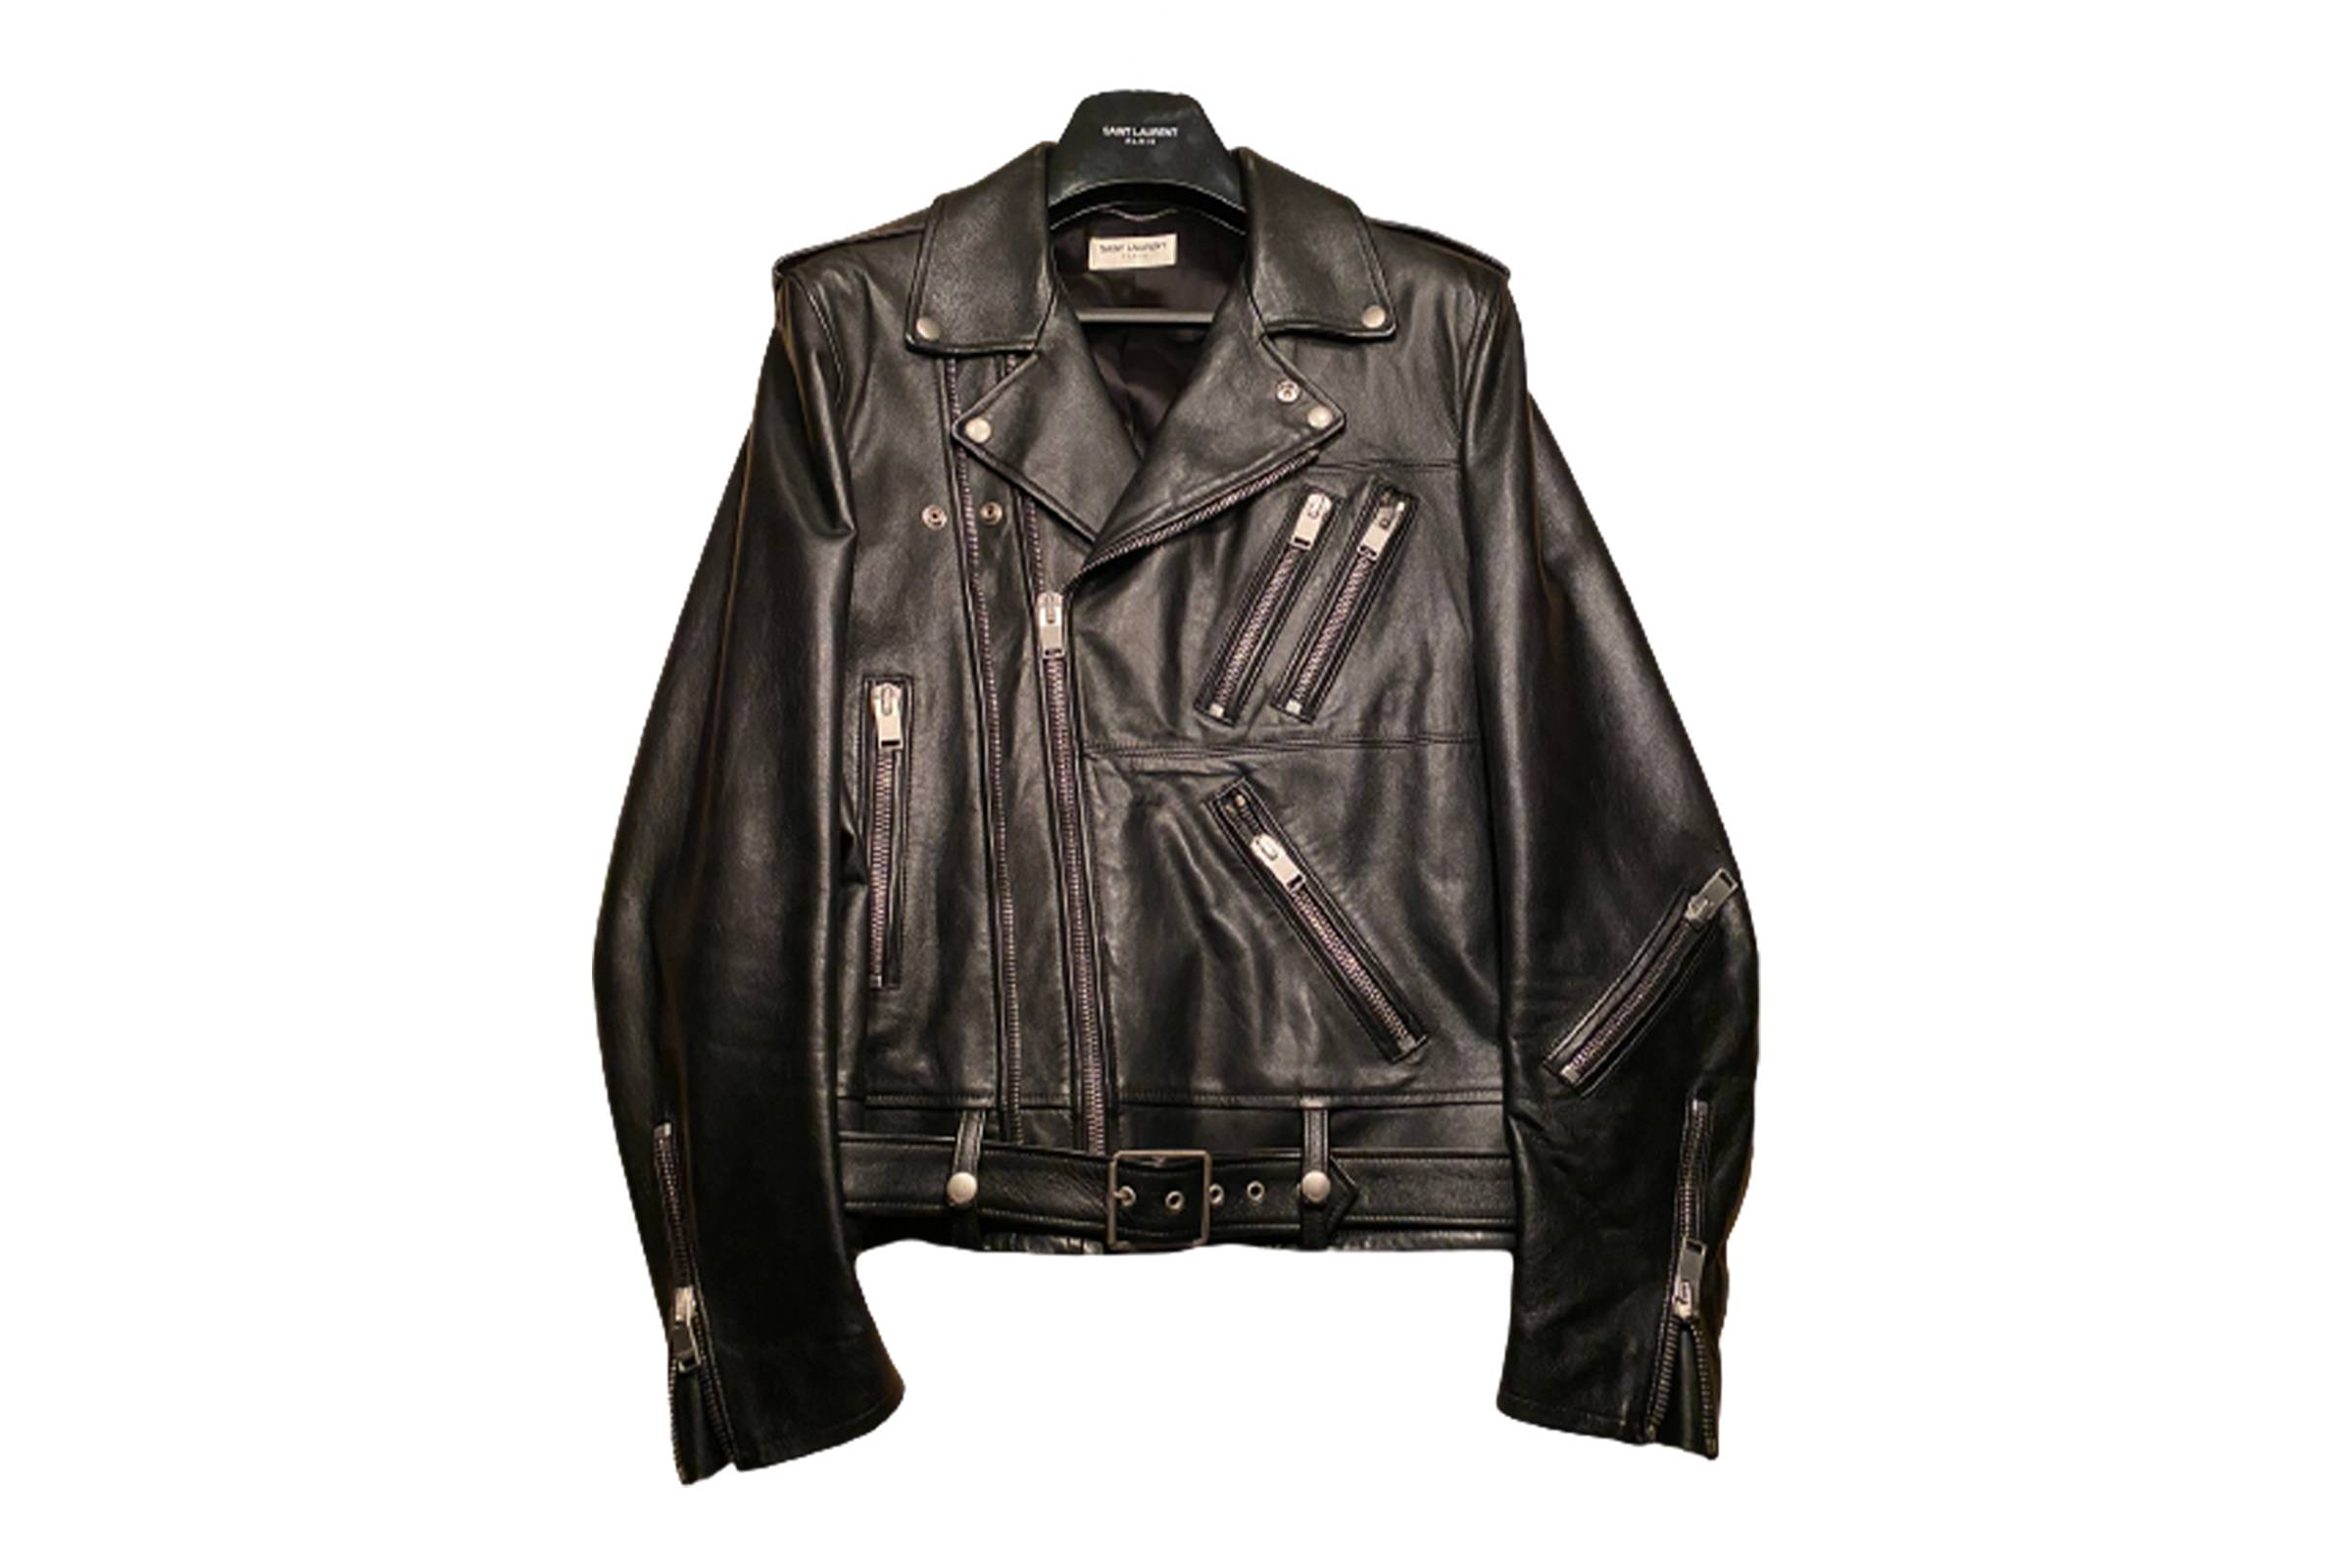 Saint Laurent Paris Spring/Summer 2014 Multi Zip Leather Jacket